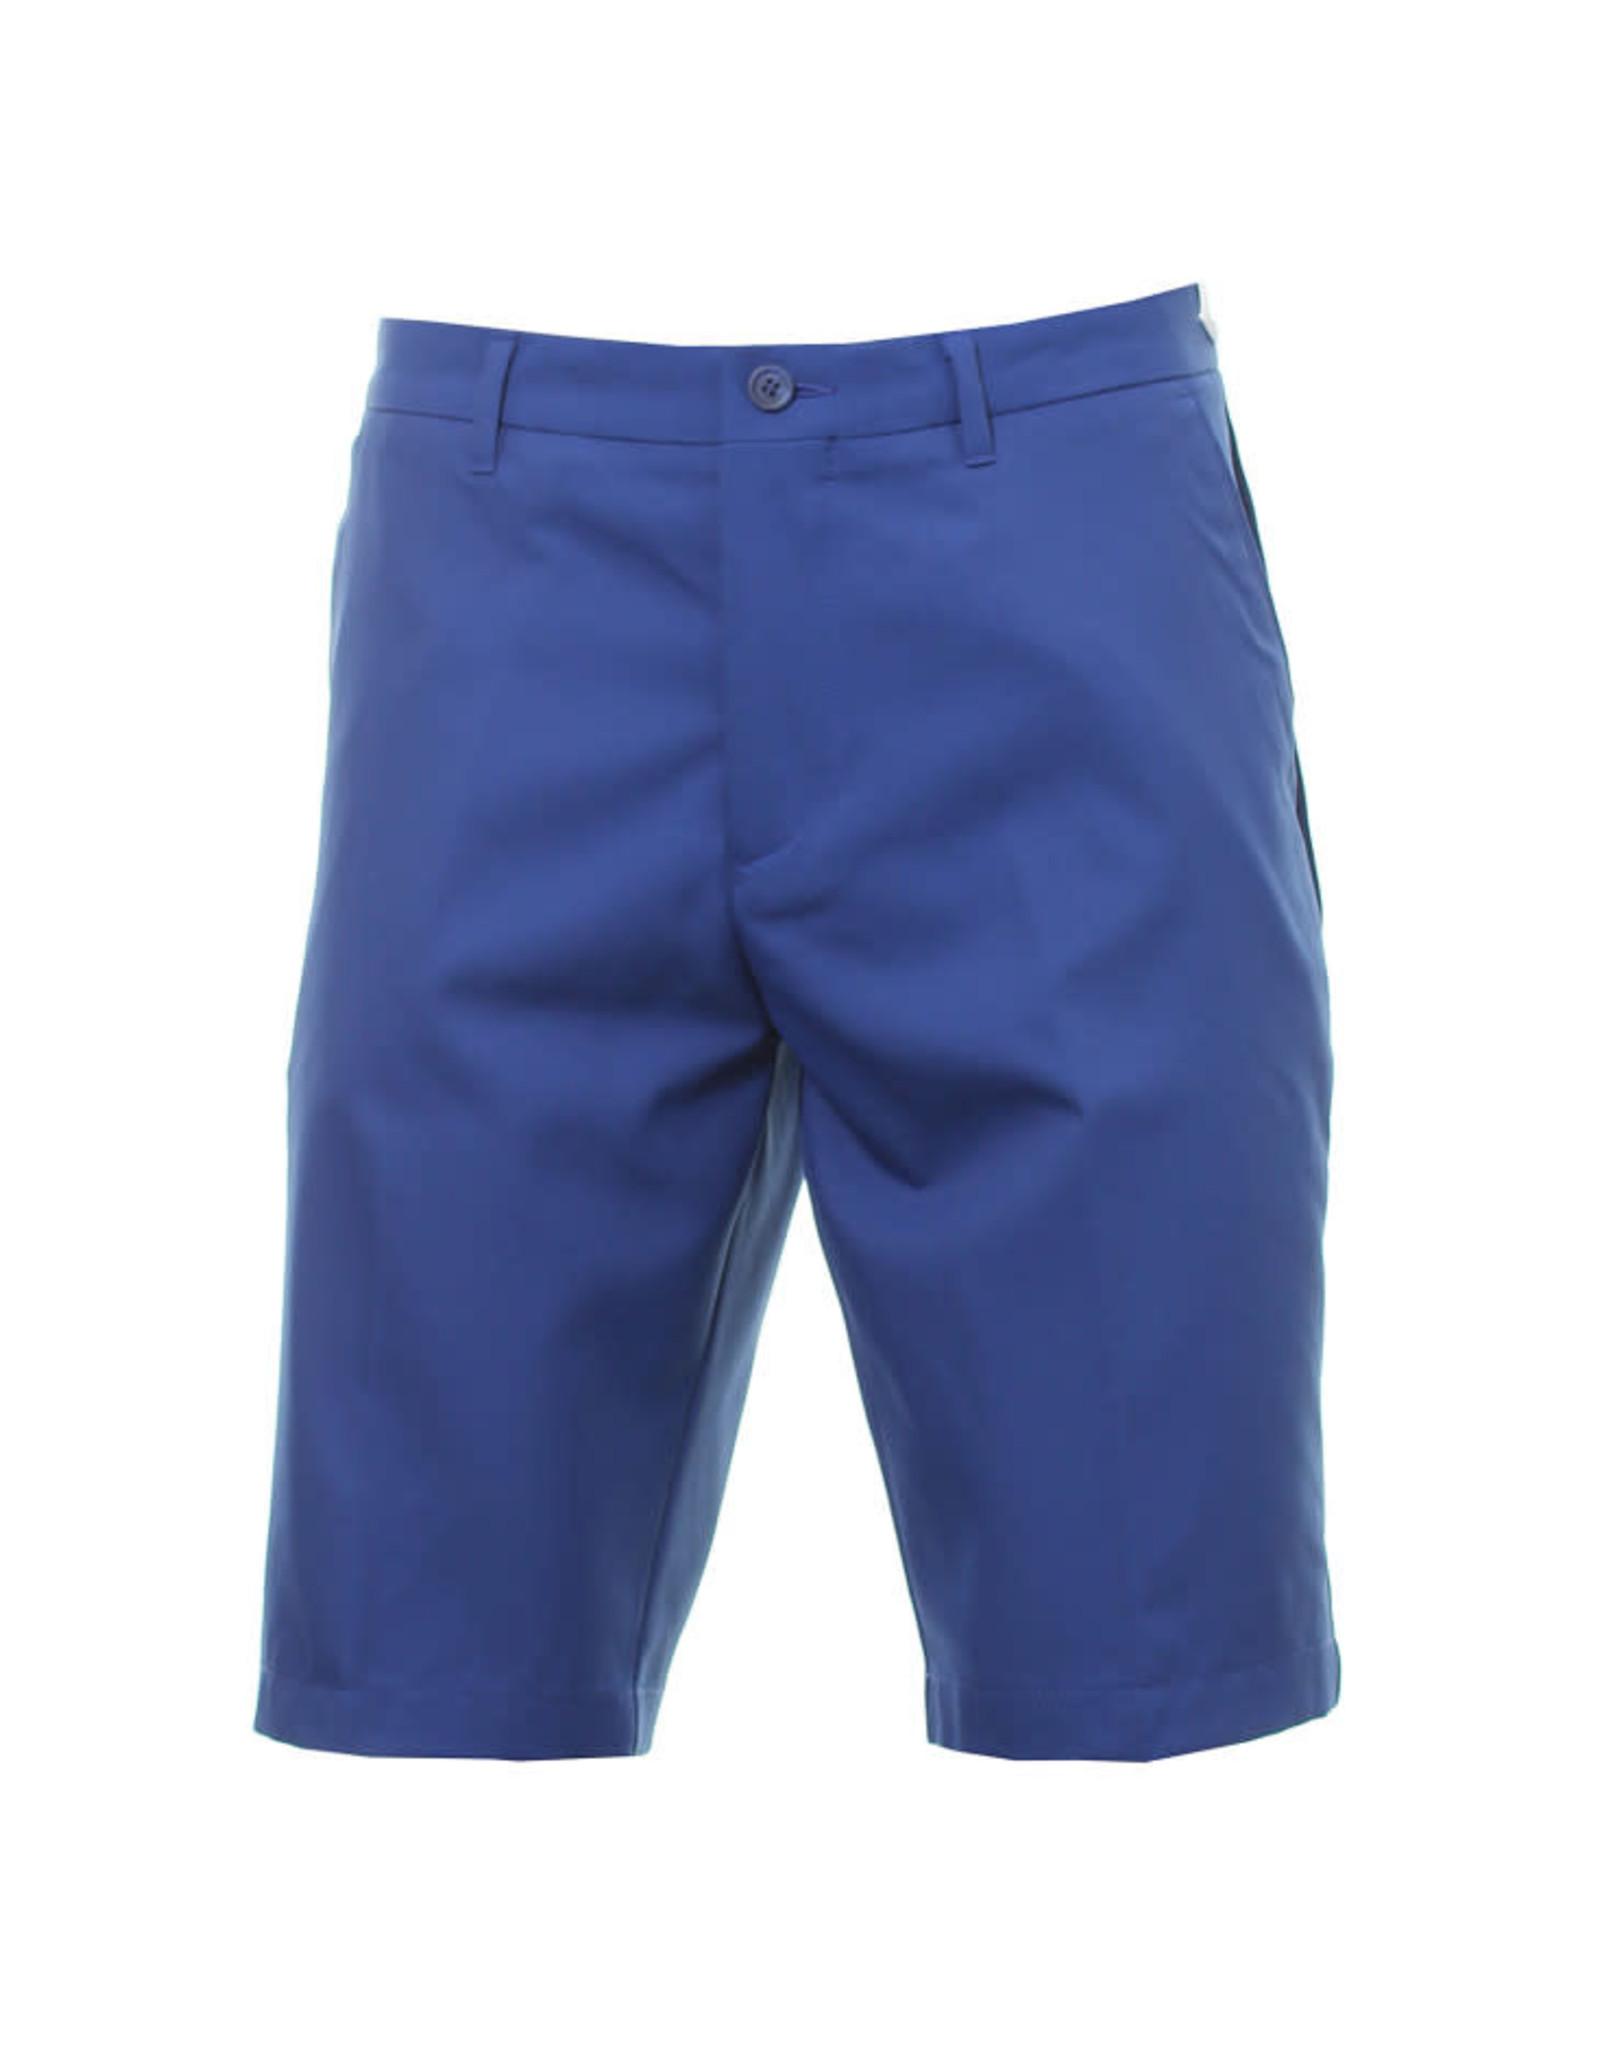 Hugo Boss Hugo Boss Stretch Golf Shorts